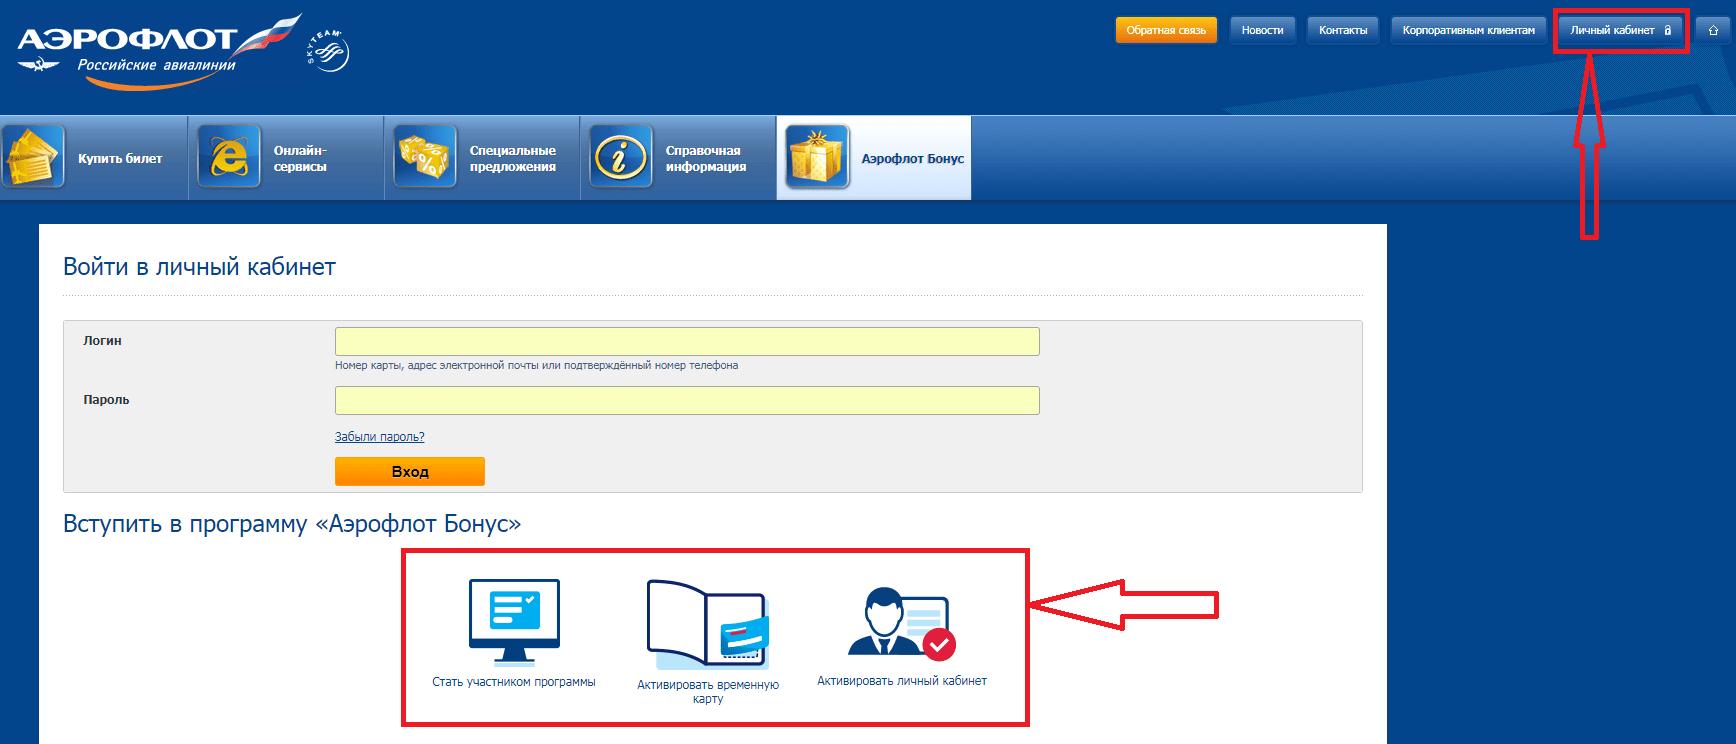 Lichnyj-kabinet-Aeroflot-Bonus-2.png